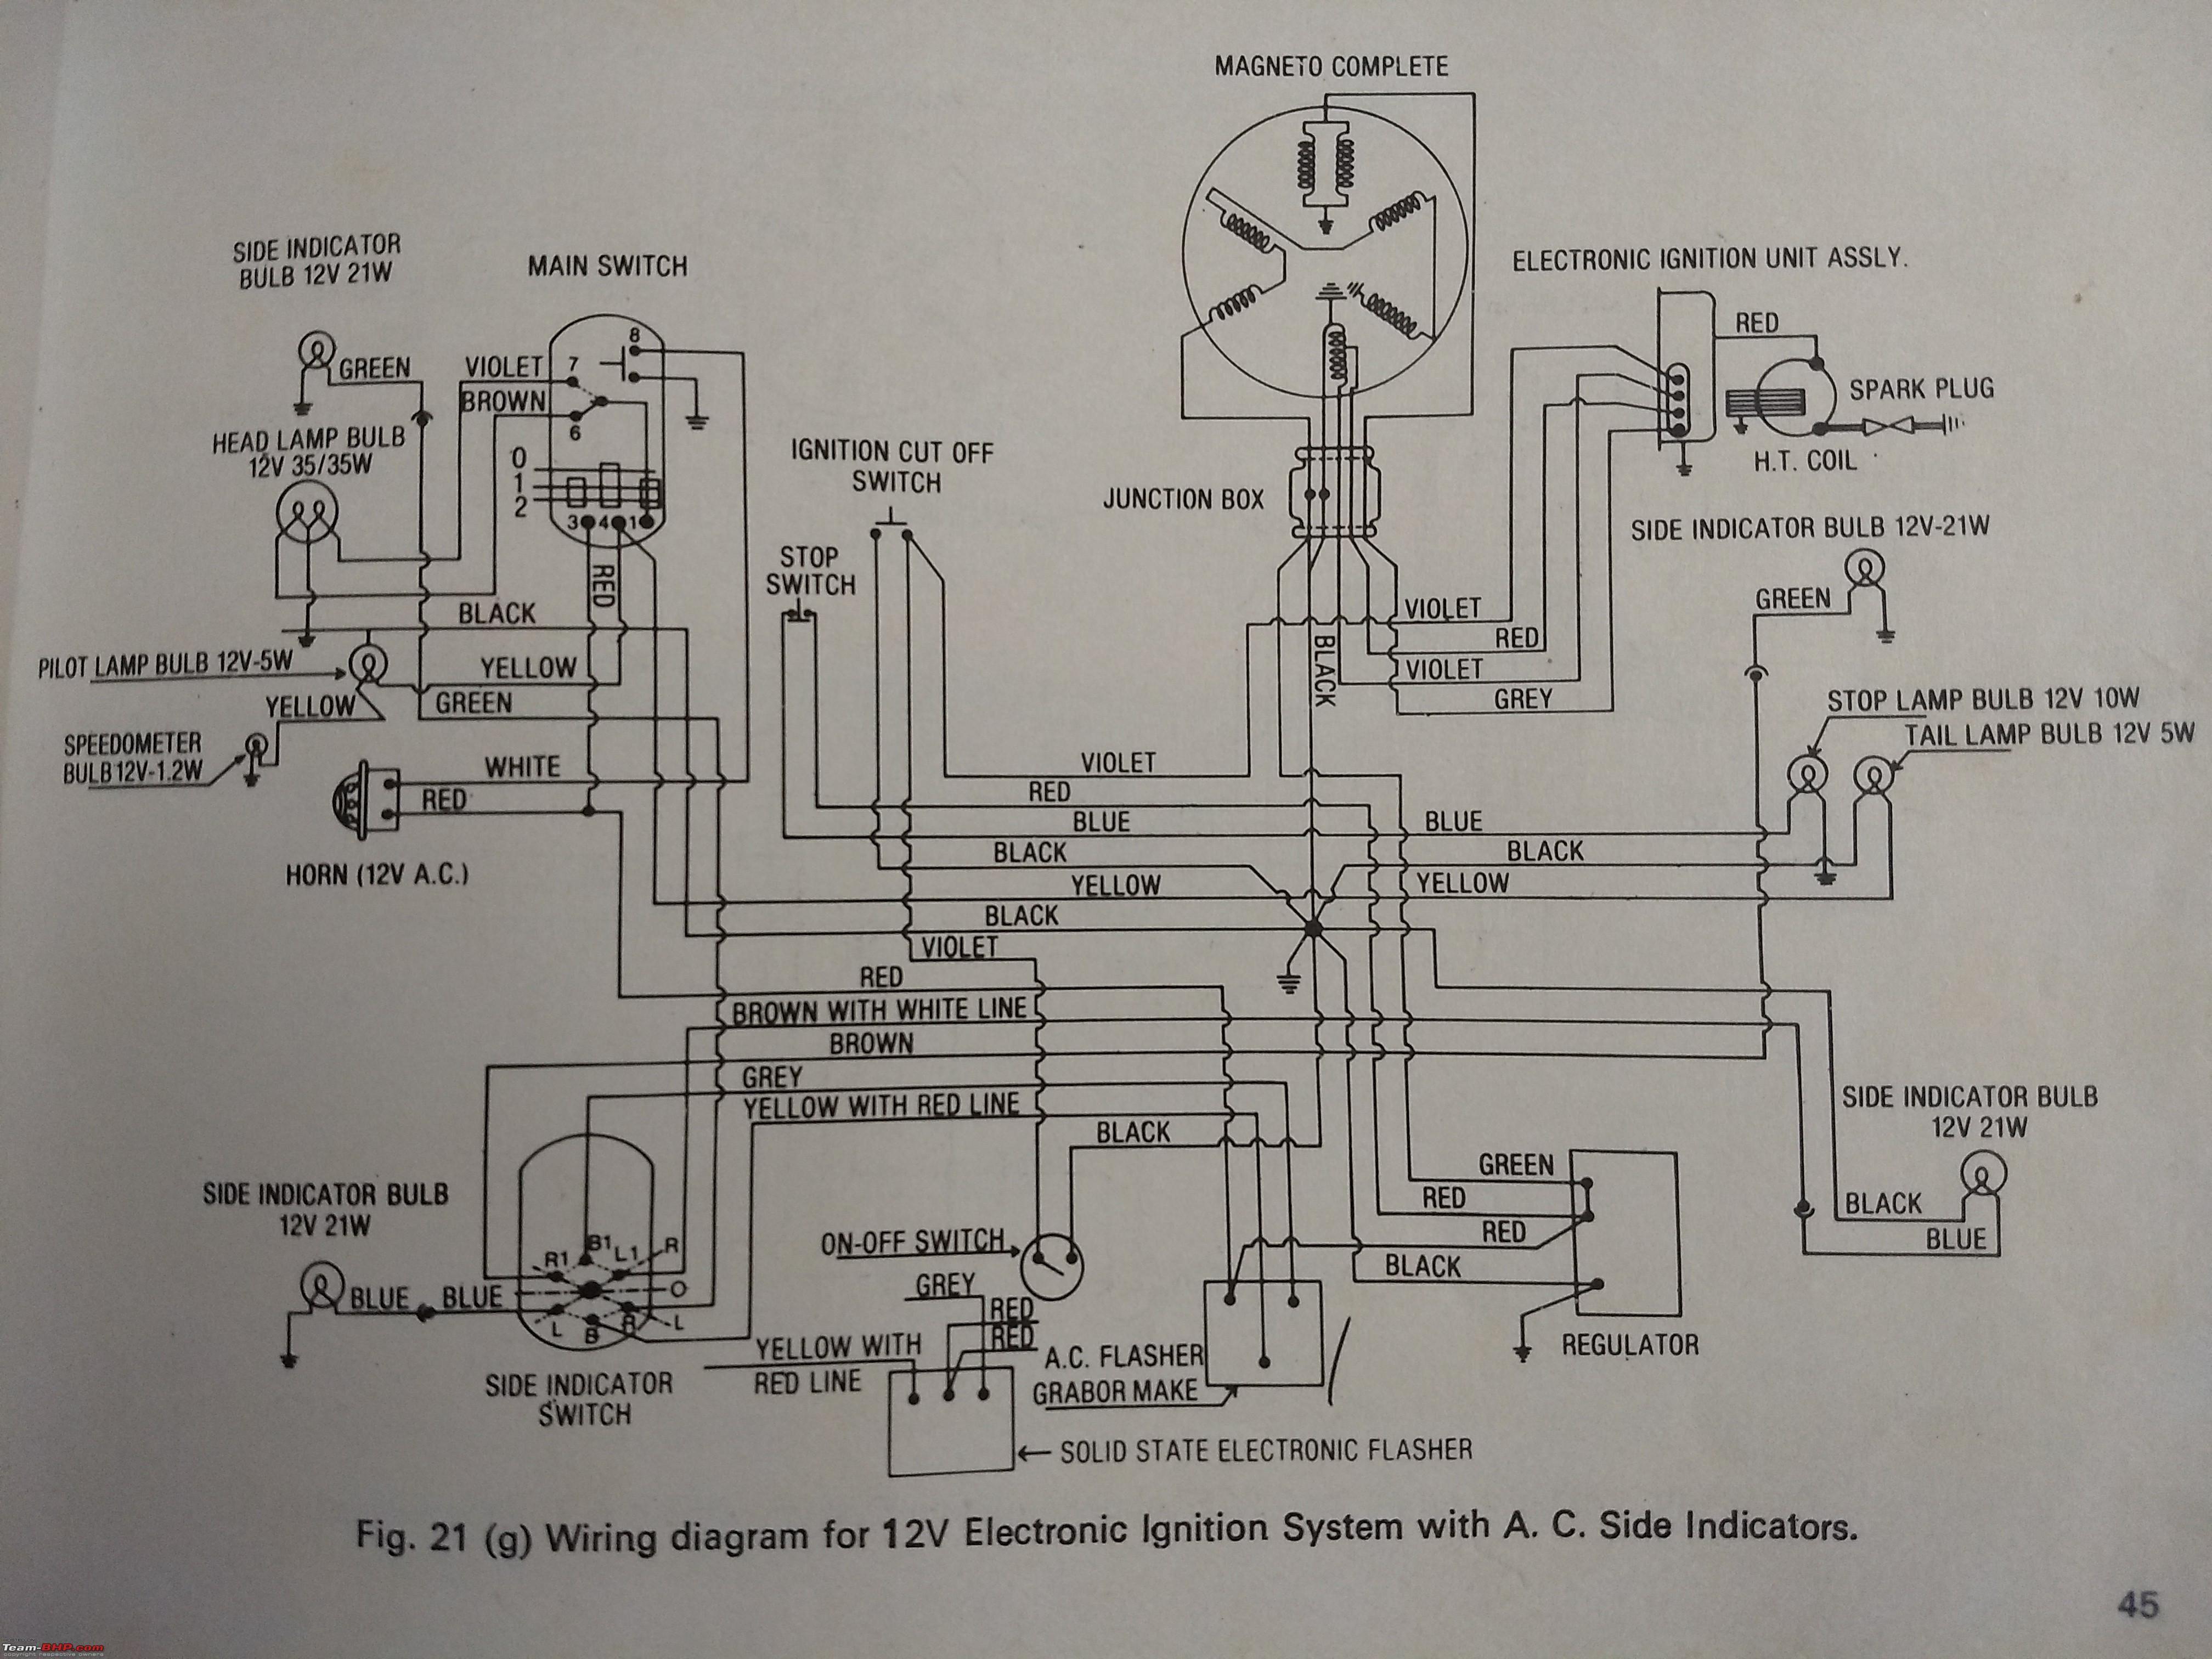 Hero Honda Wiring Diagram Http Bookingritzcarlton Info Hero Honda Wiring Diagram Electrical Wiring Diagram Diagram Diagram Design